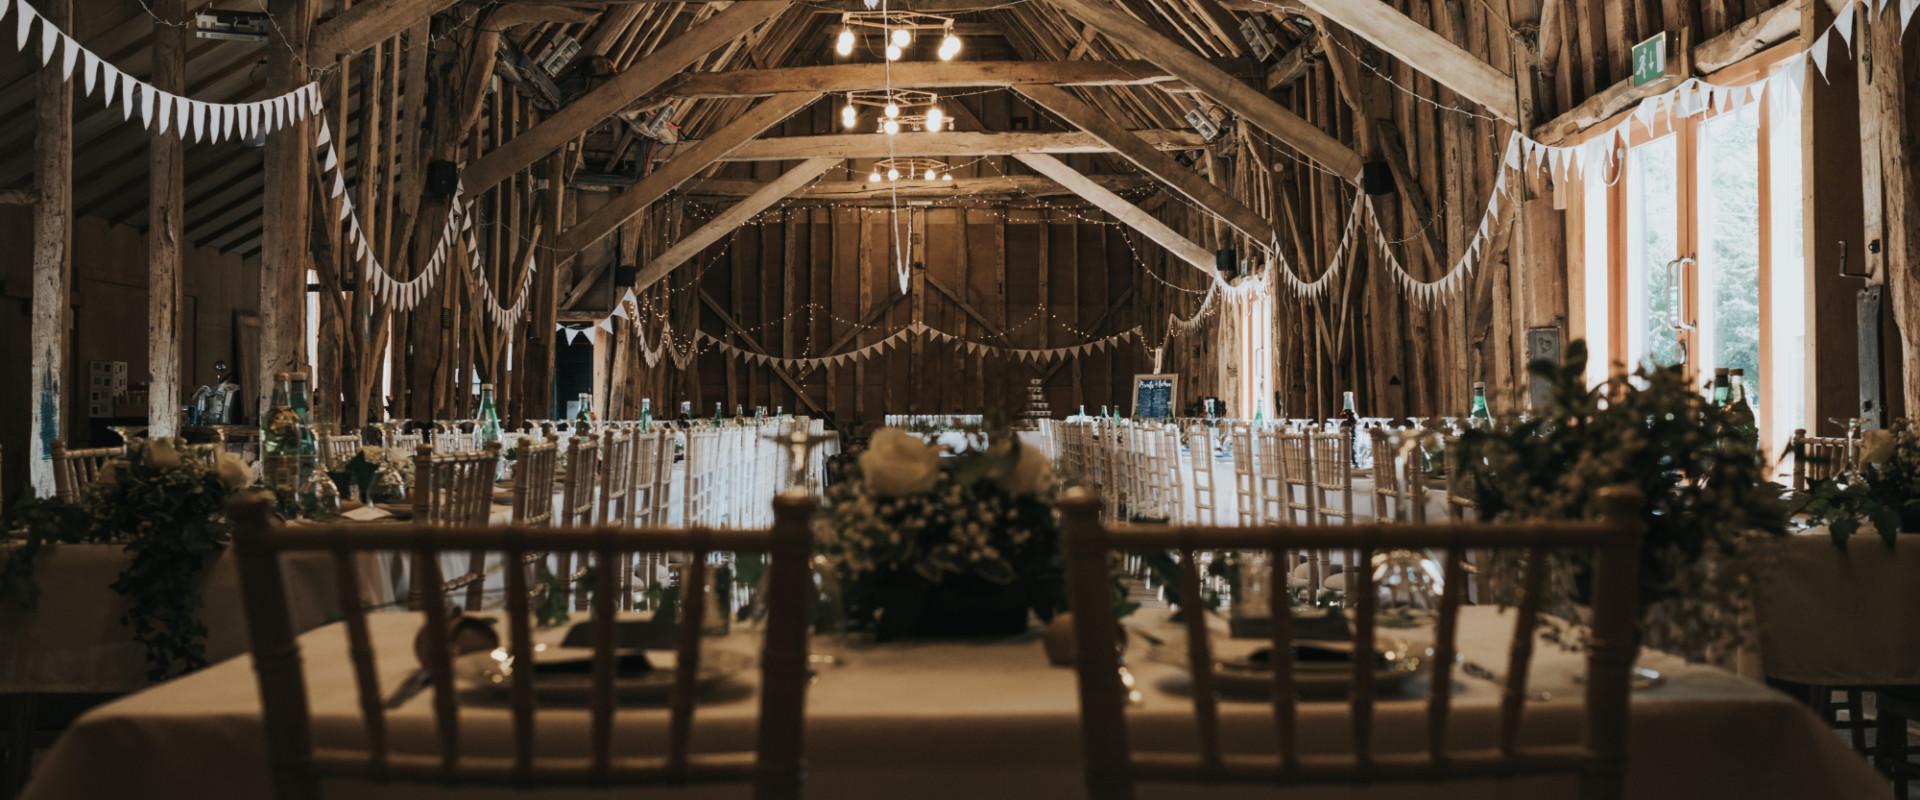 Wedding reception set up at The Tythe Barn, Rustic Wedding Venue